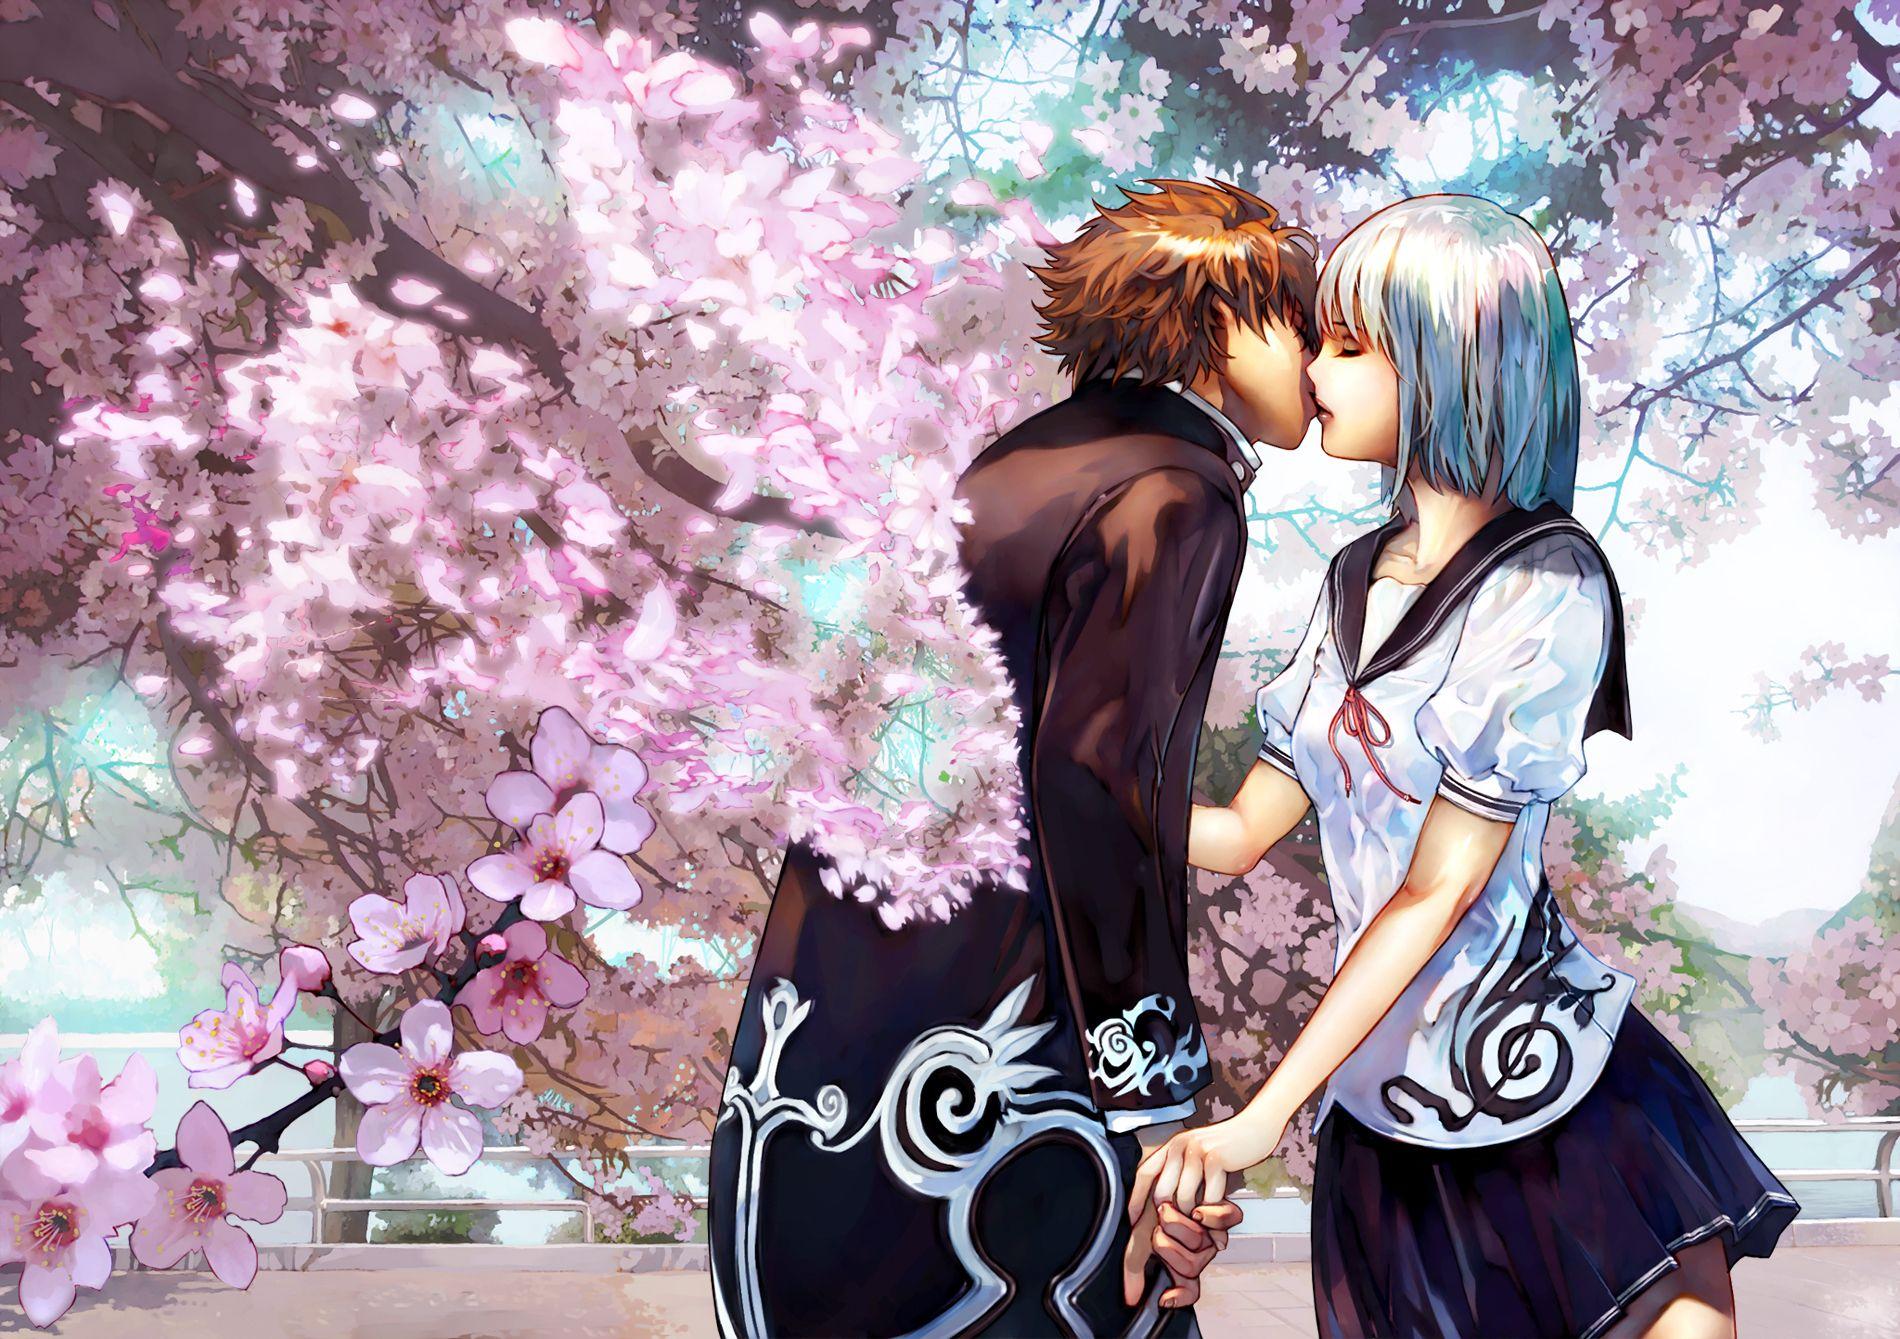 Anime Love HD Wallpaper ANIME/MANGA Pinterest Anime